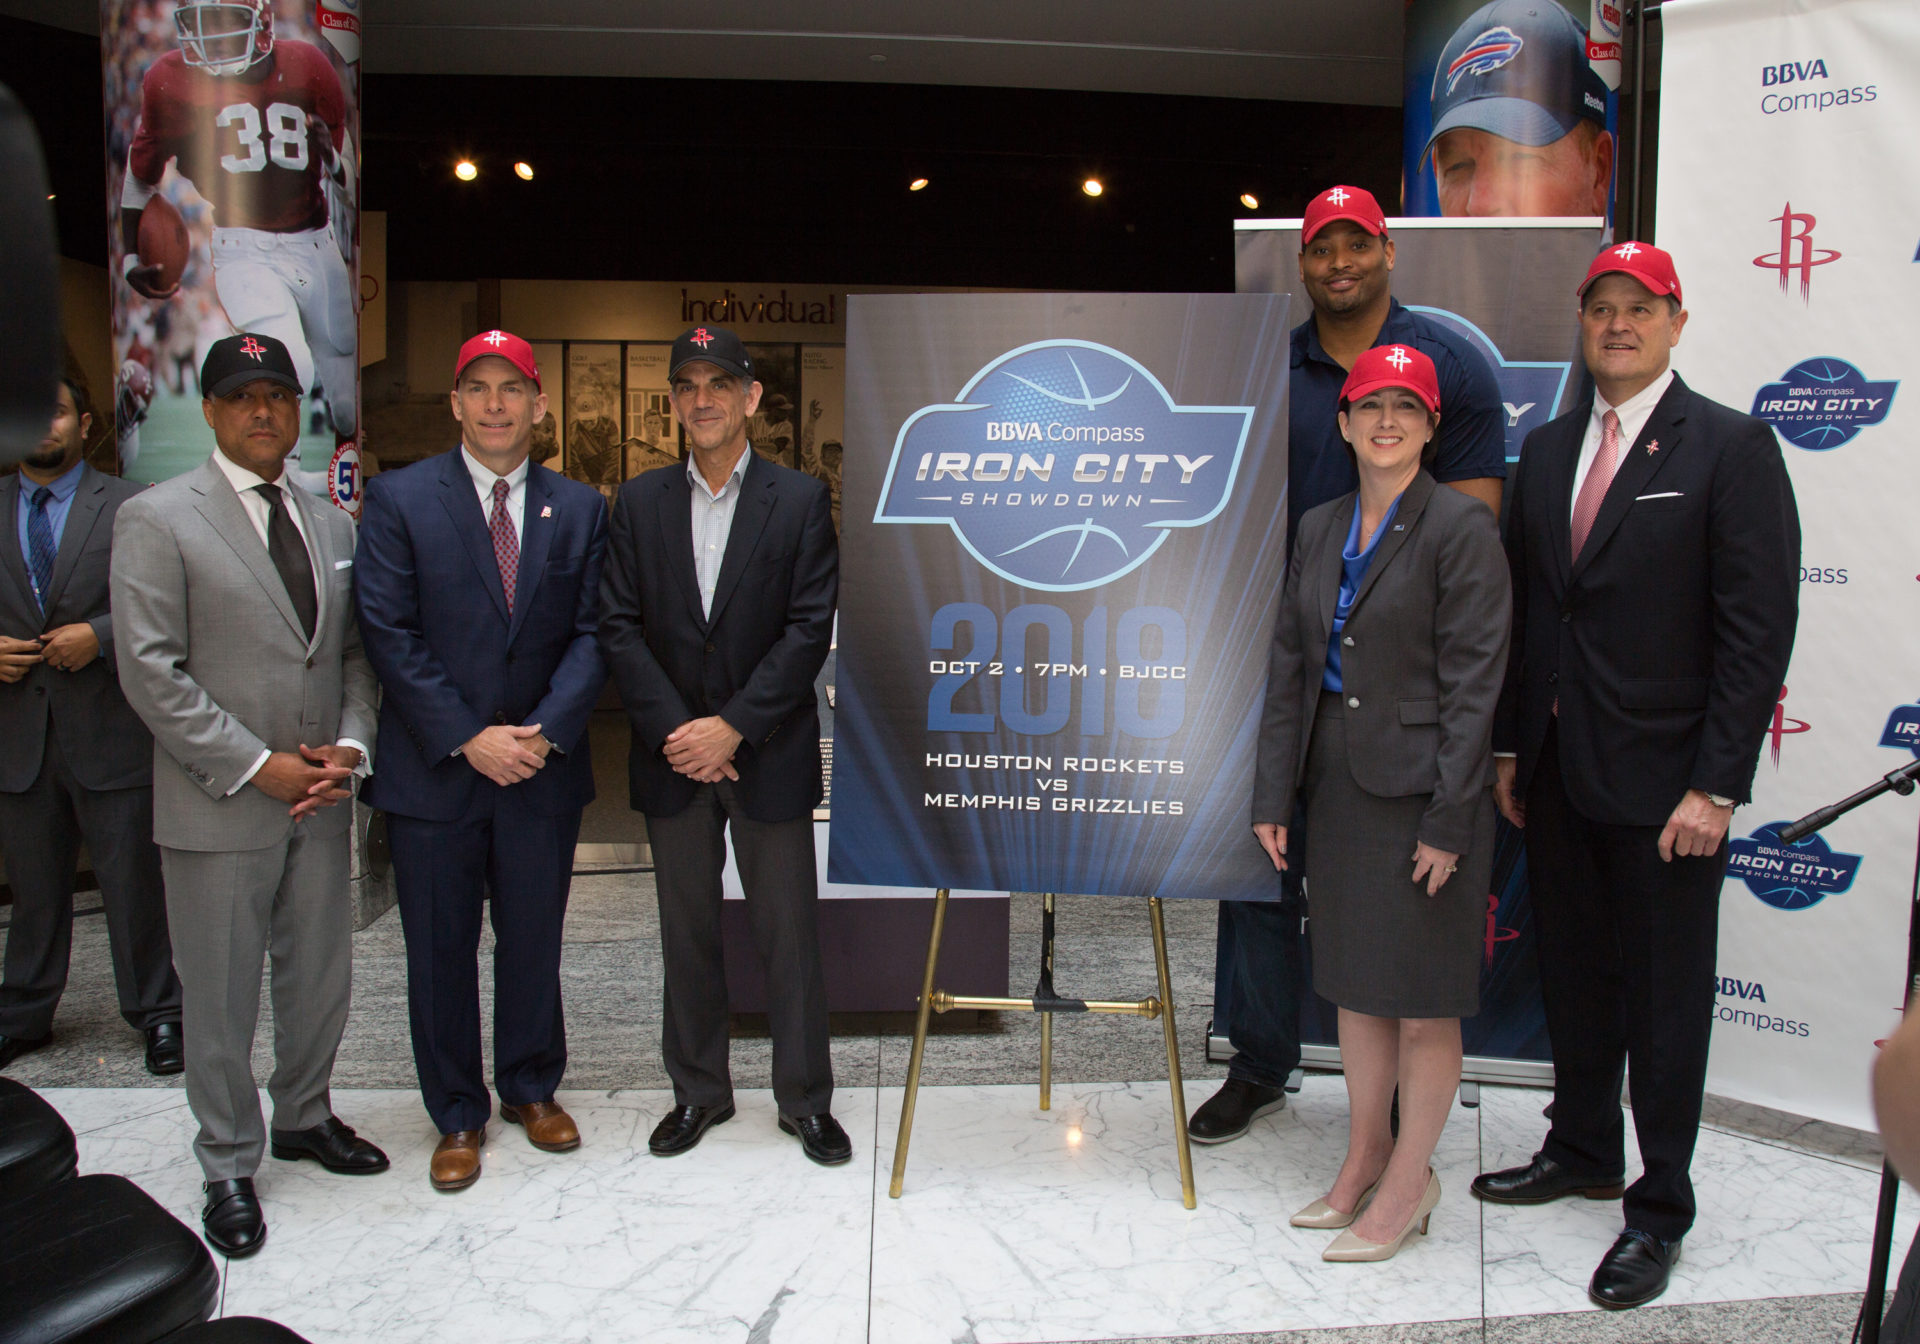 BBVA Compass Iron City Showdown brings the Houston Rockets and the Memphis Grizzlies to Birmingham